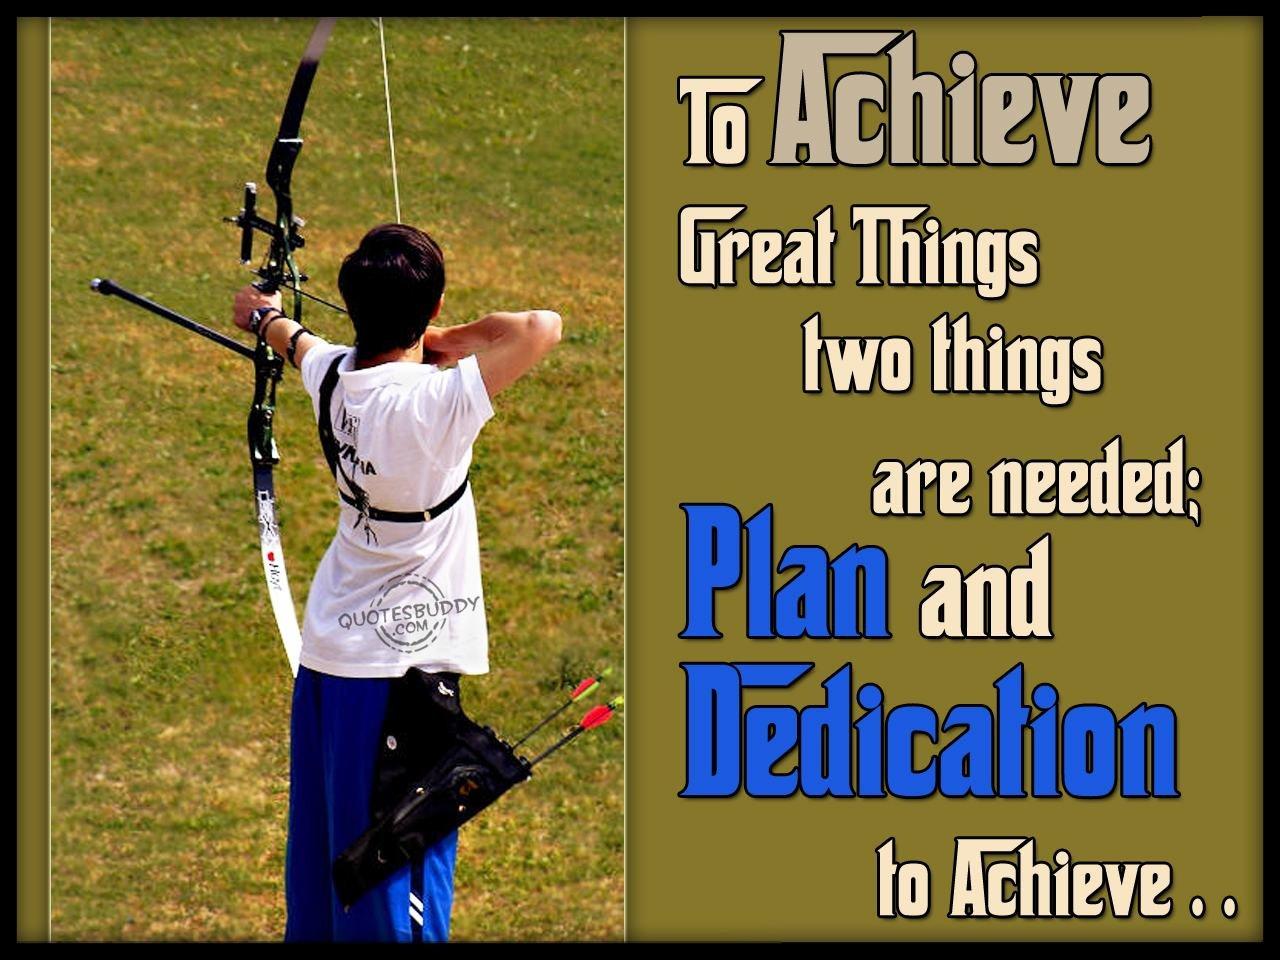 famous quotes about greatest achievement quotationof com greatest achievement quote 2